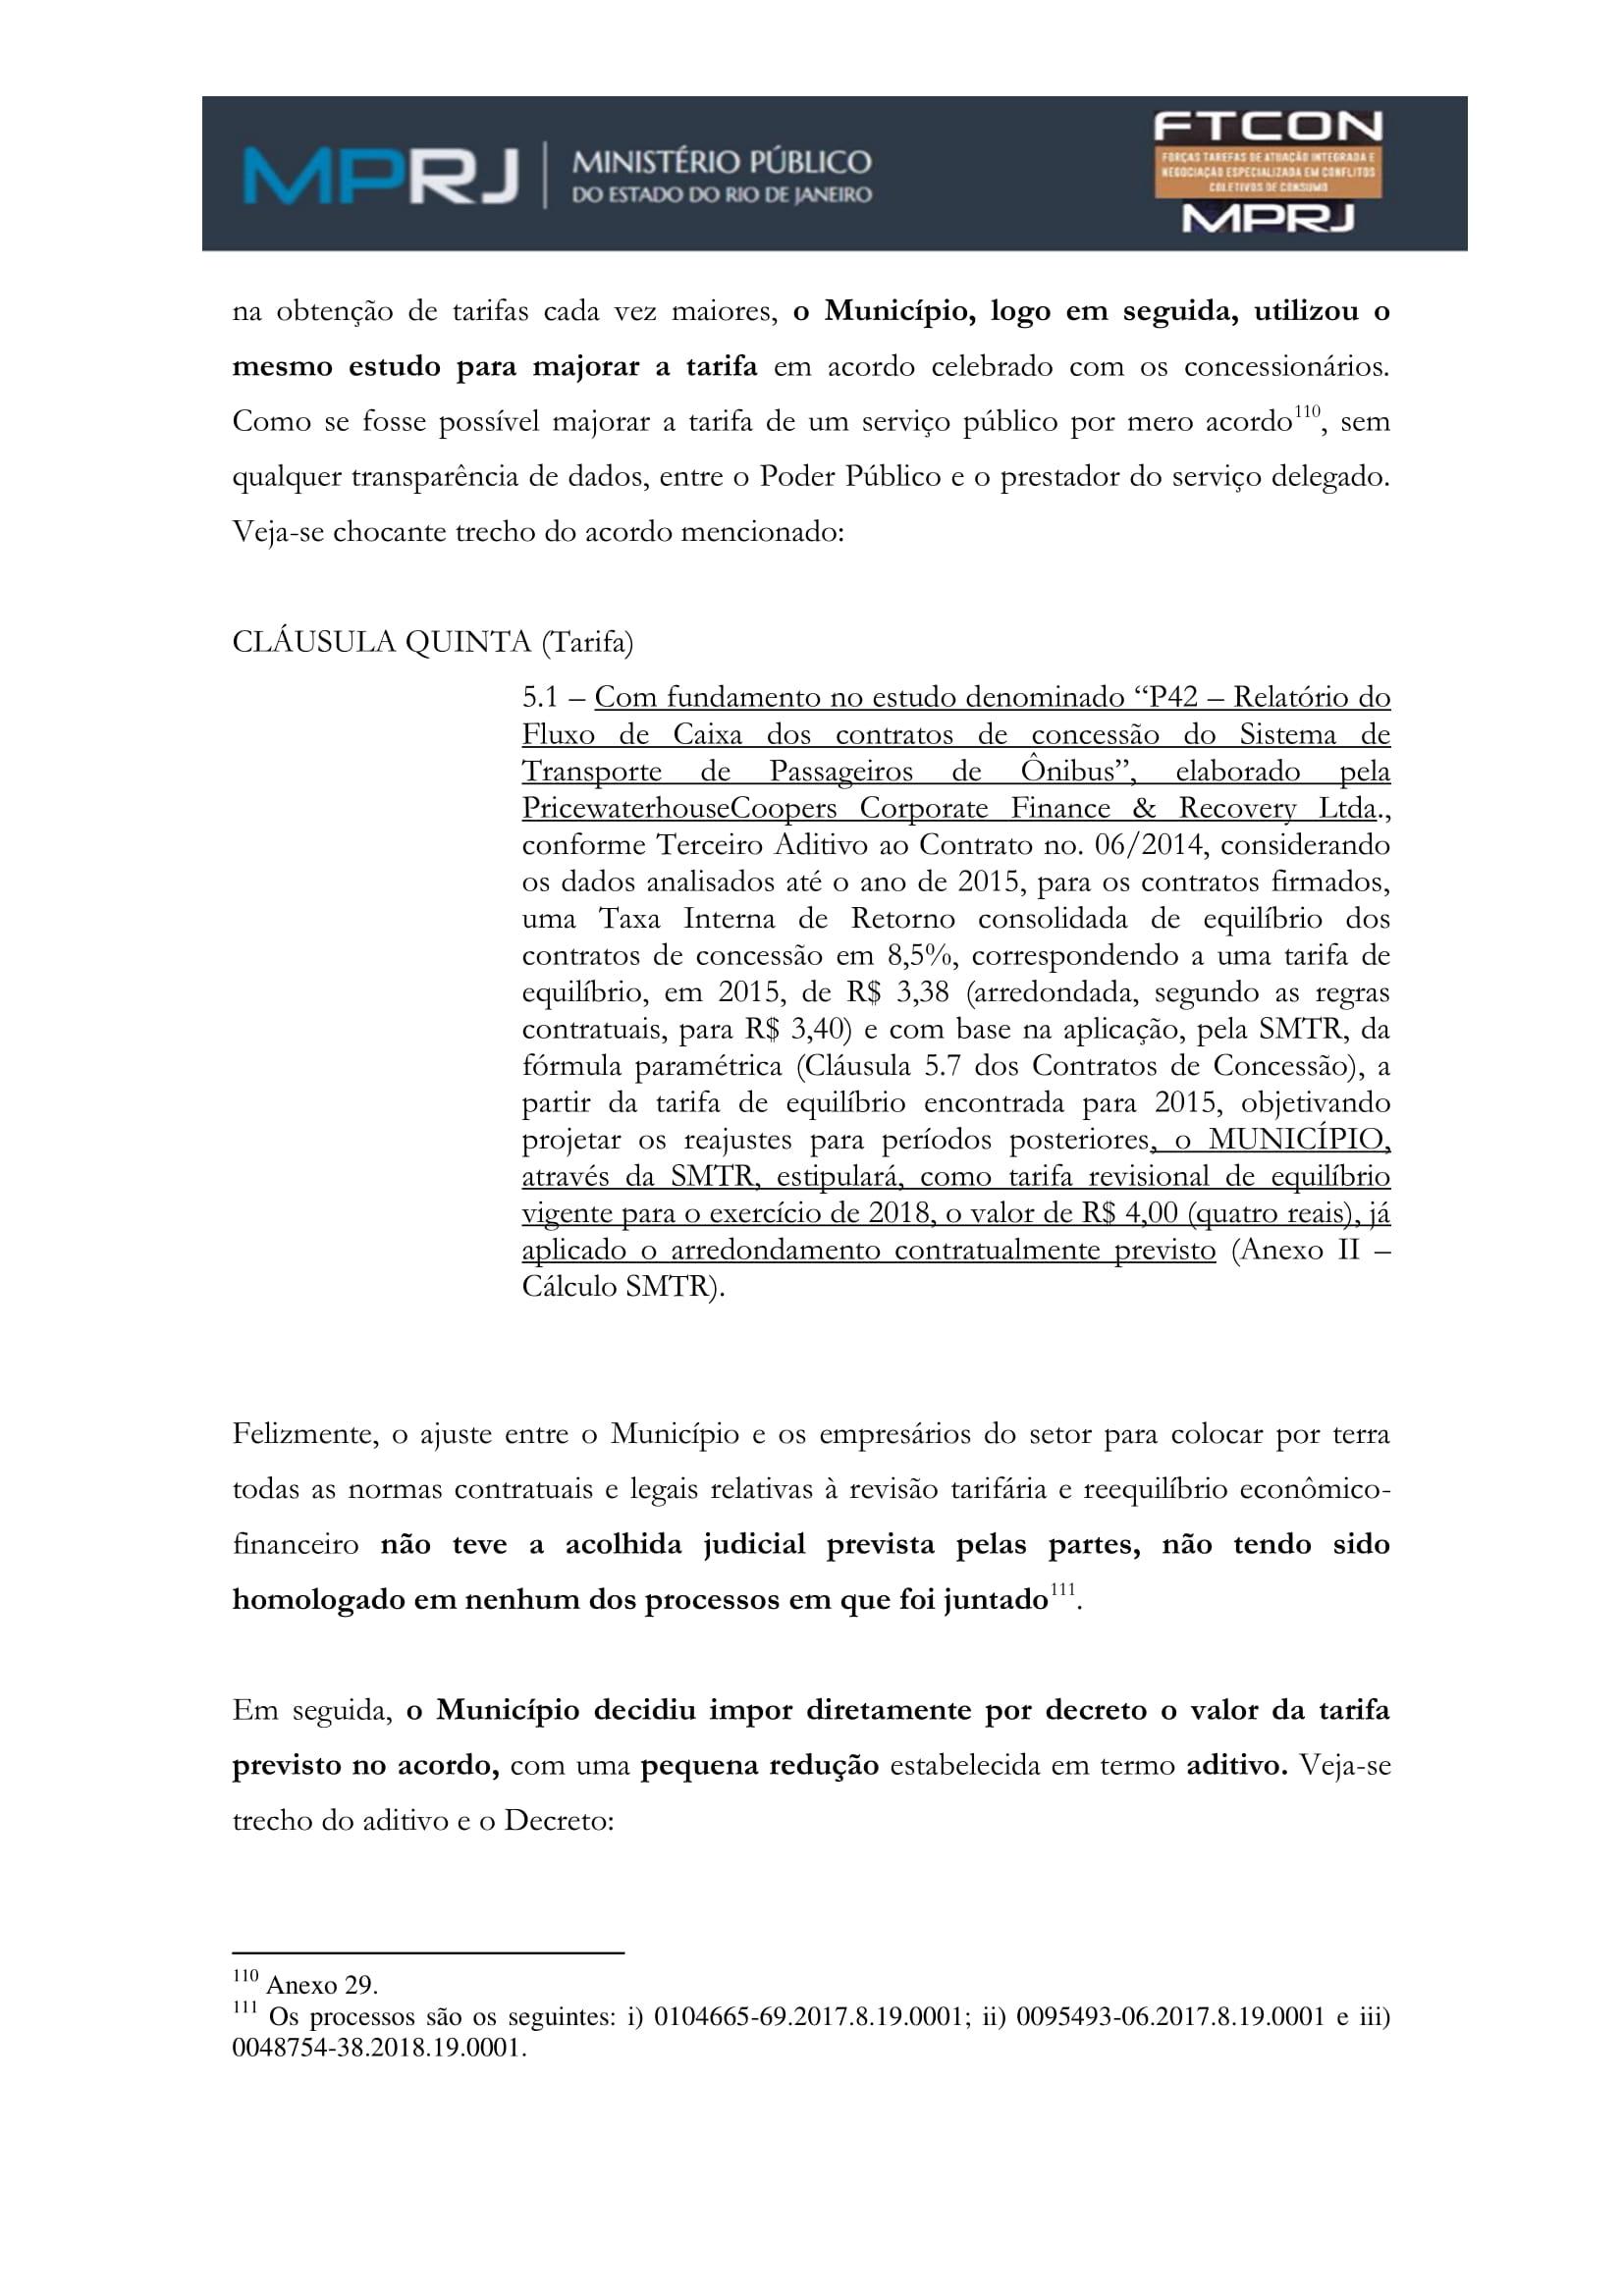 acp_caducidade_onibus_dr_rt-116